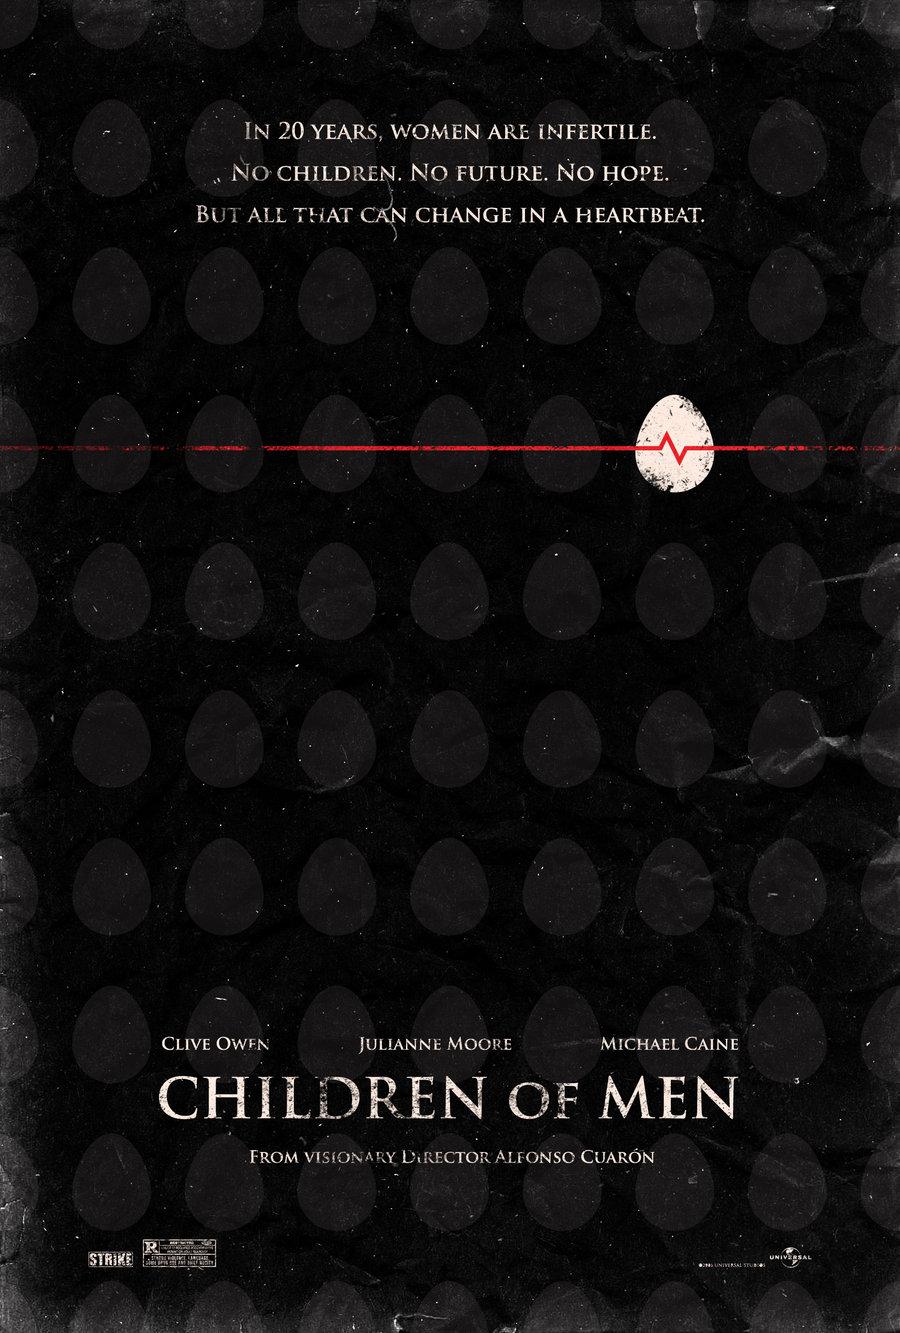 """Hijos de los hombres"" (2006). Poster alternativo de Adam Rabalais. Fuente: www.adamrabalais.deviantart.com"